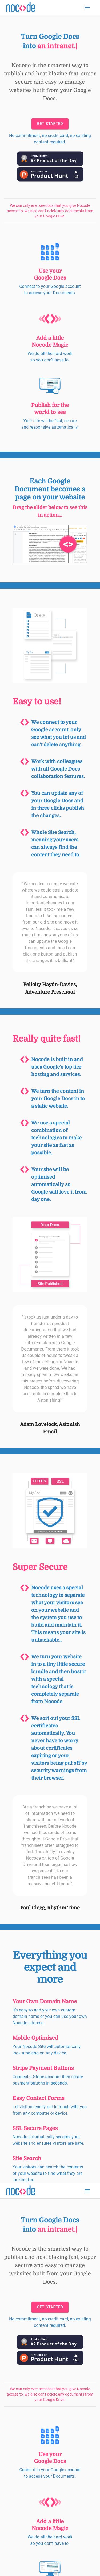 Example of Design for Internet & Telecom, Web Services, Web Design & Development, Mobile Landing Page by nocode.works | Mobile Landing Page Design